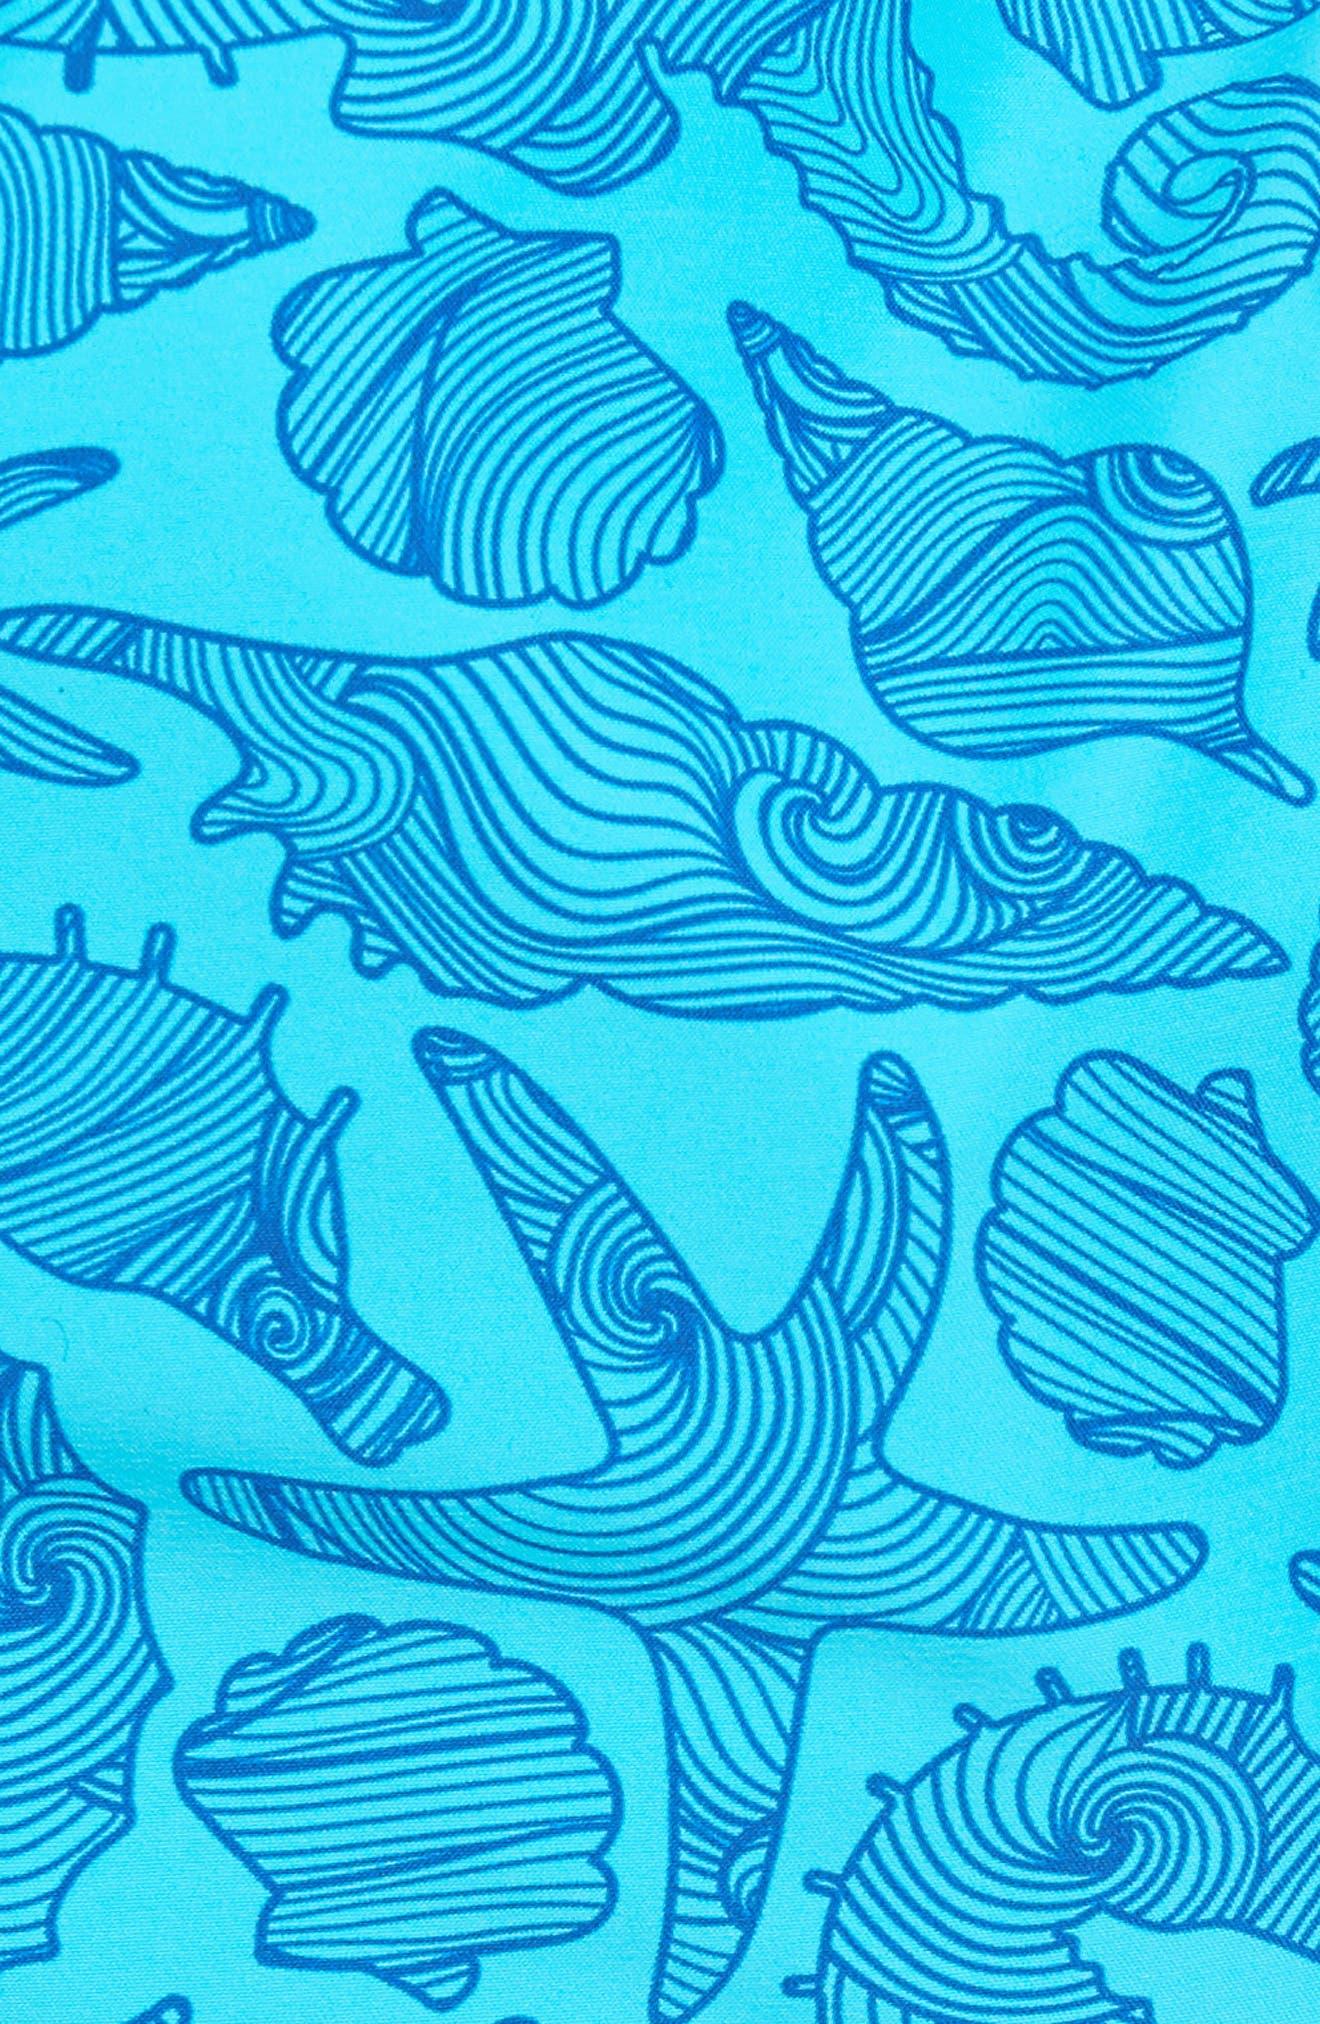 Seahorse Print Swim Trunks,                             Alternate thumbnail 5, color,                             432